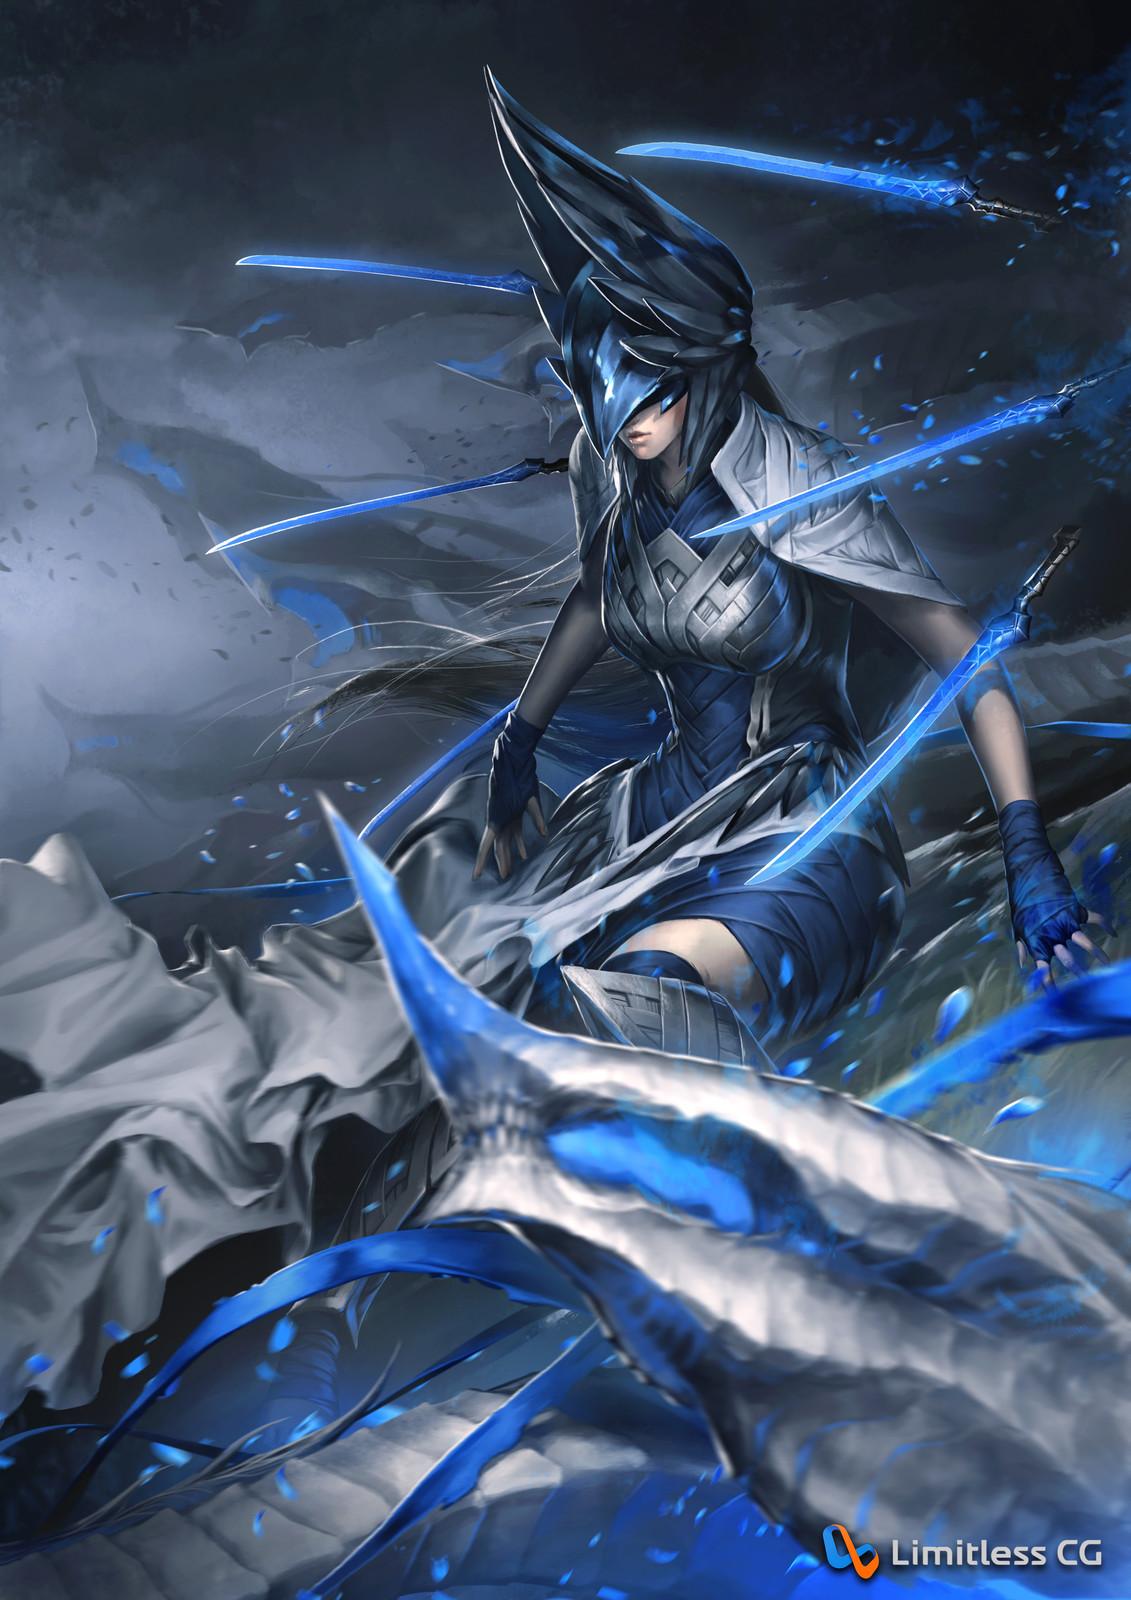 Nyx goddess of night final